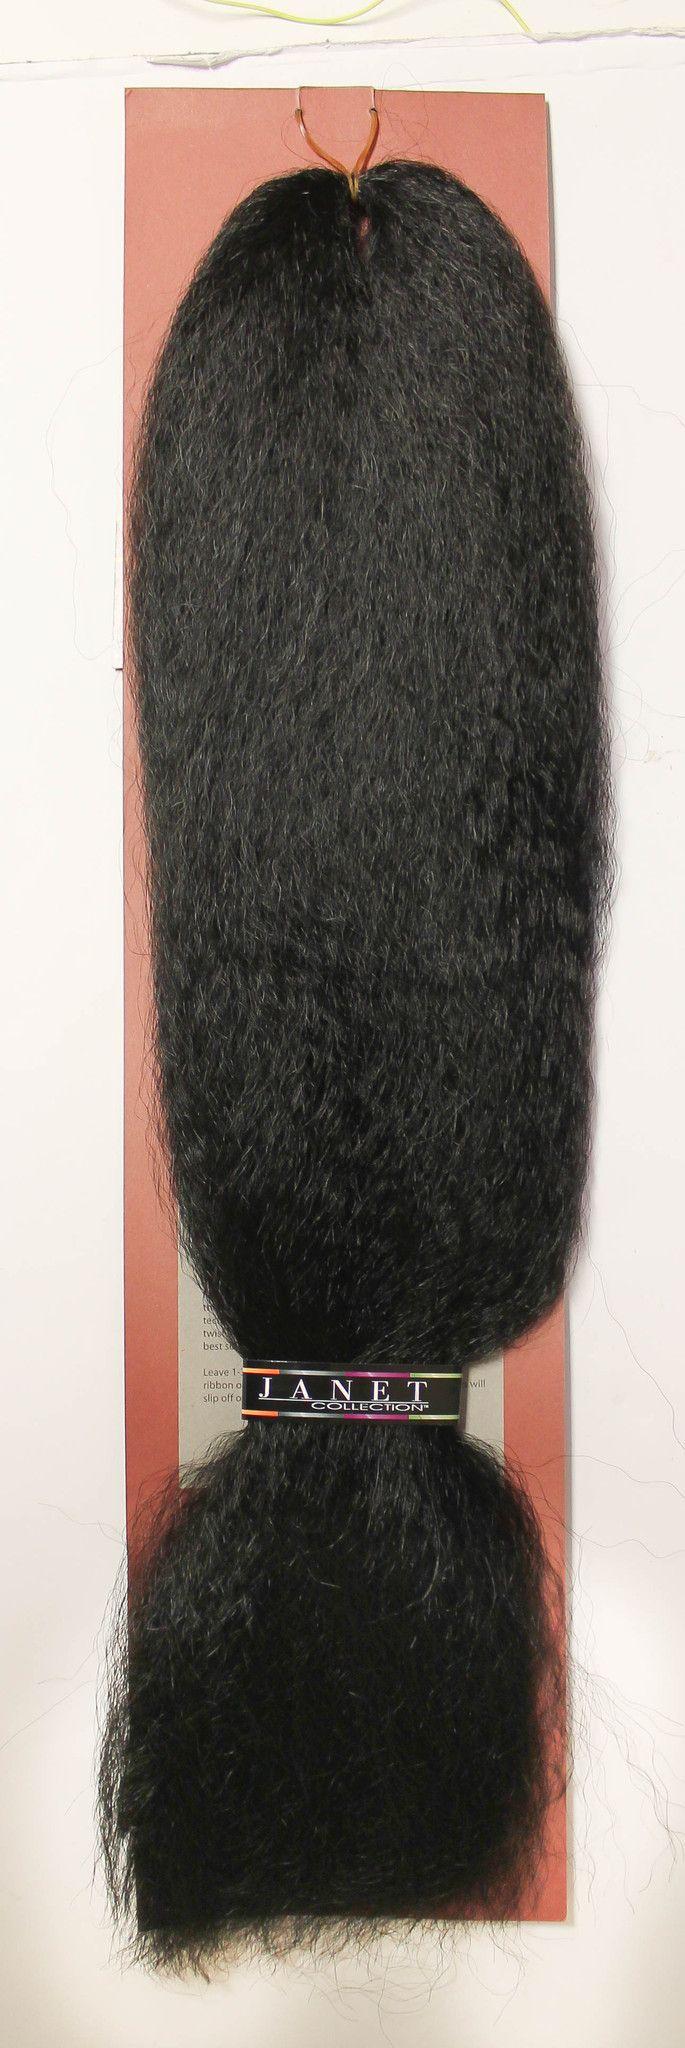 Janet Collection Jumbo Braiding Hair